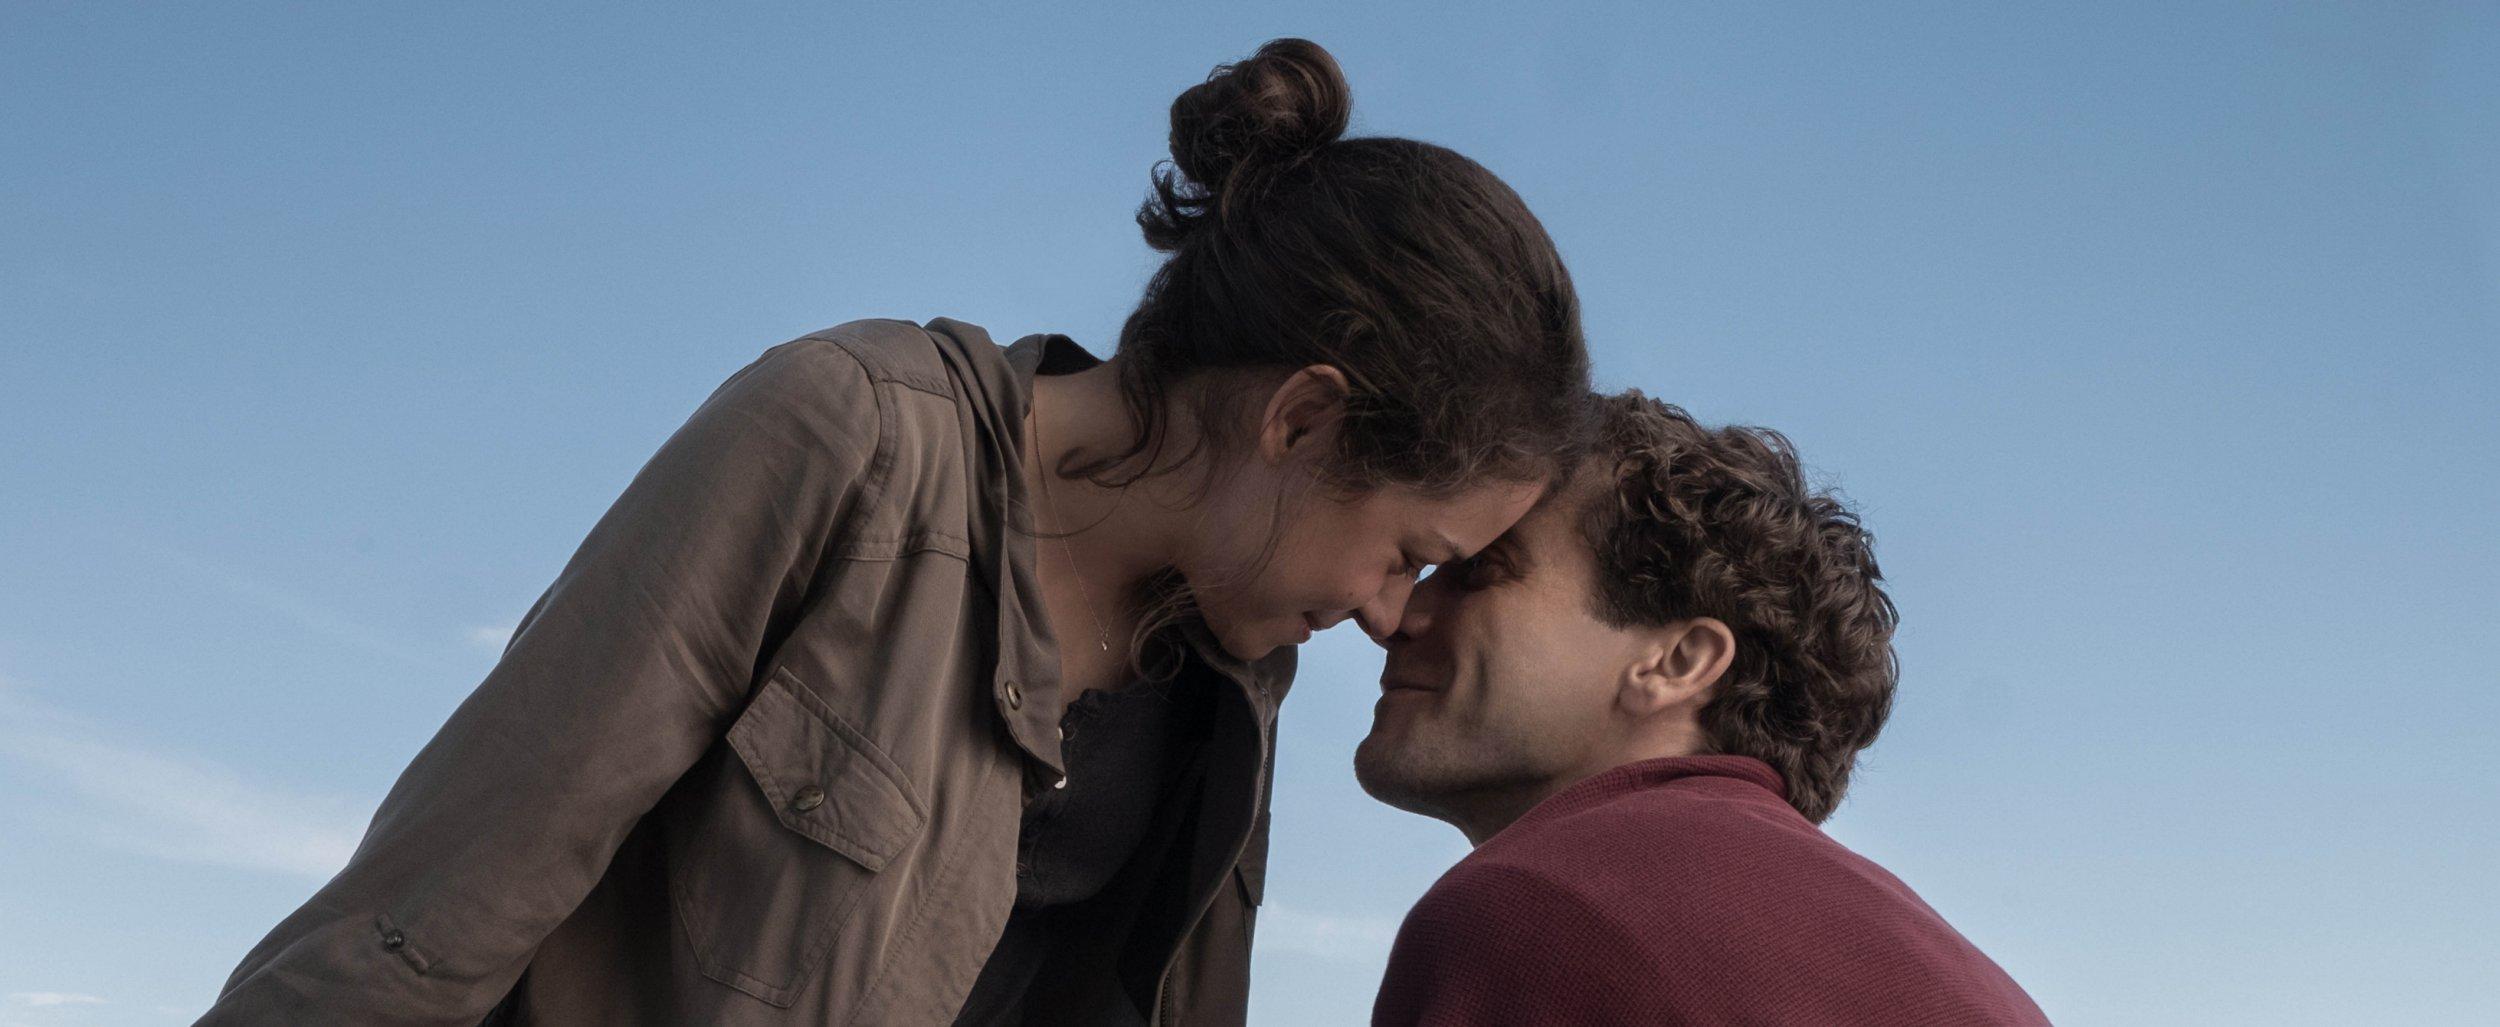 Stronger is a story 'of hope when the world feels hopeless', says Tatiana Maslany